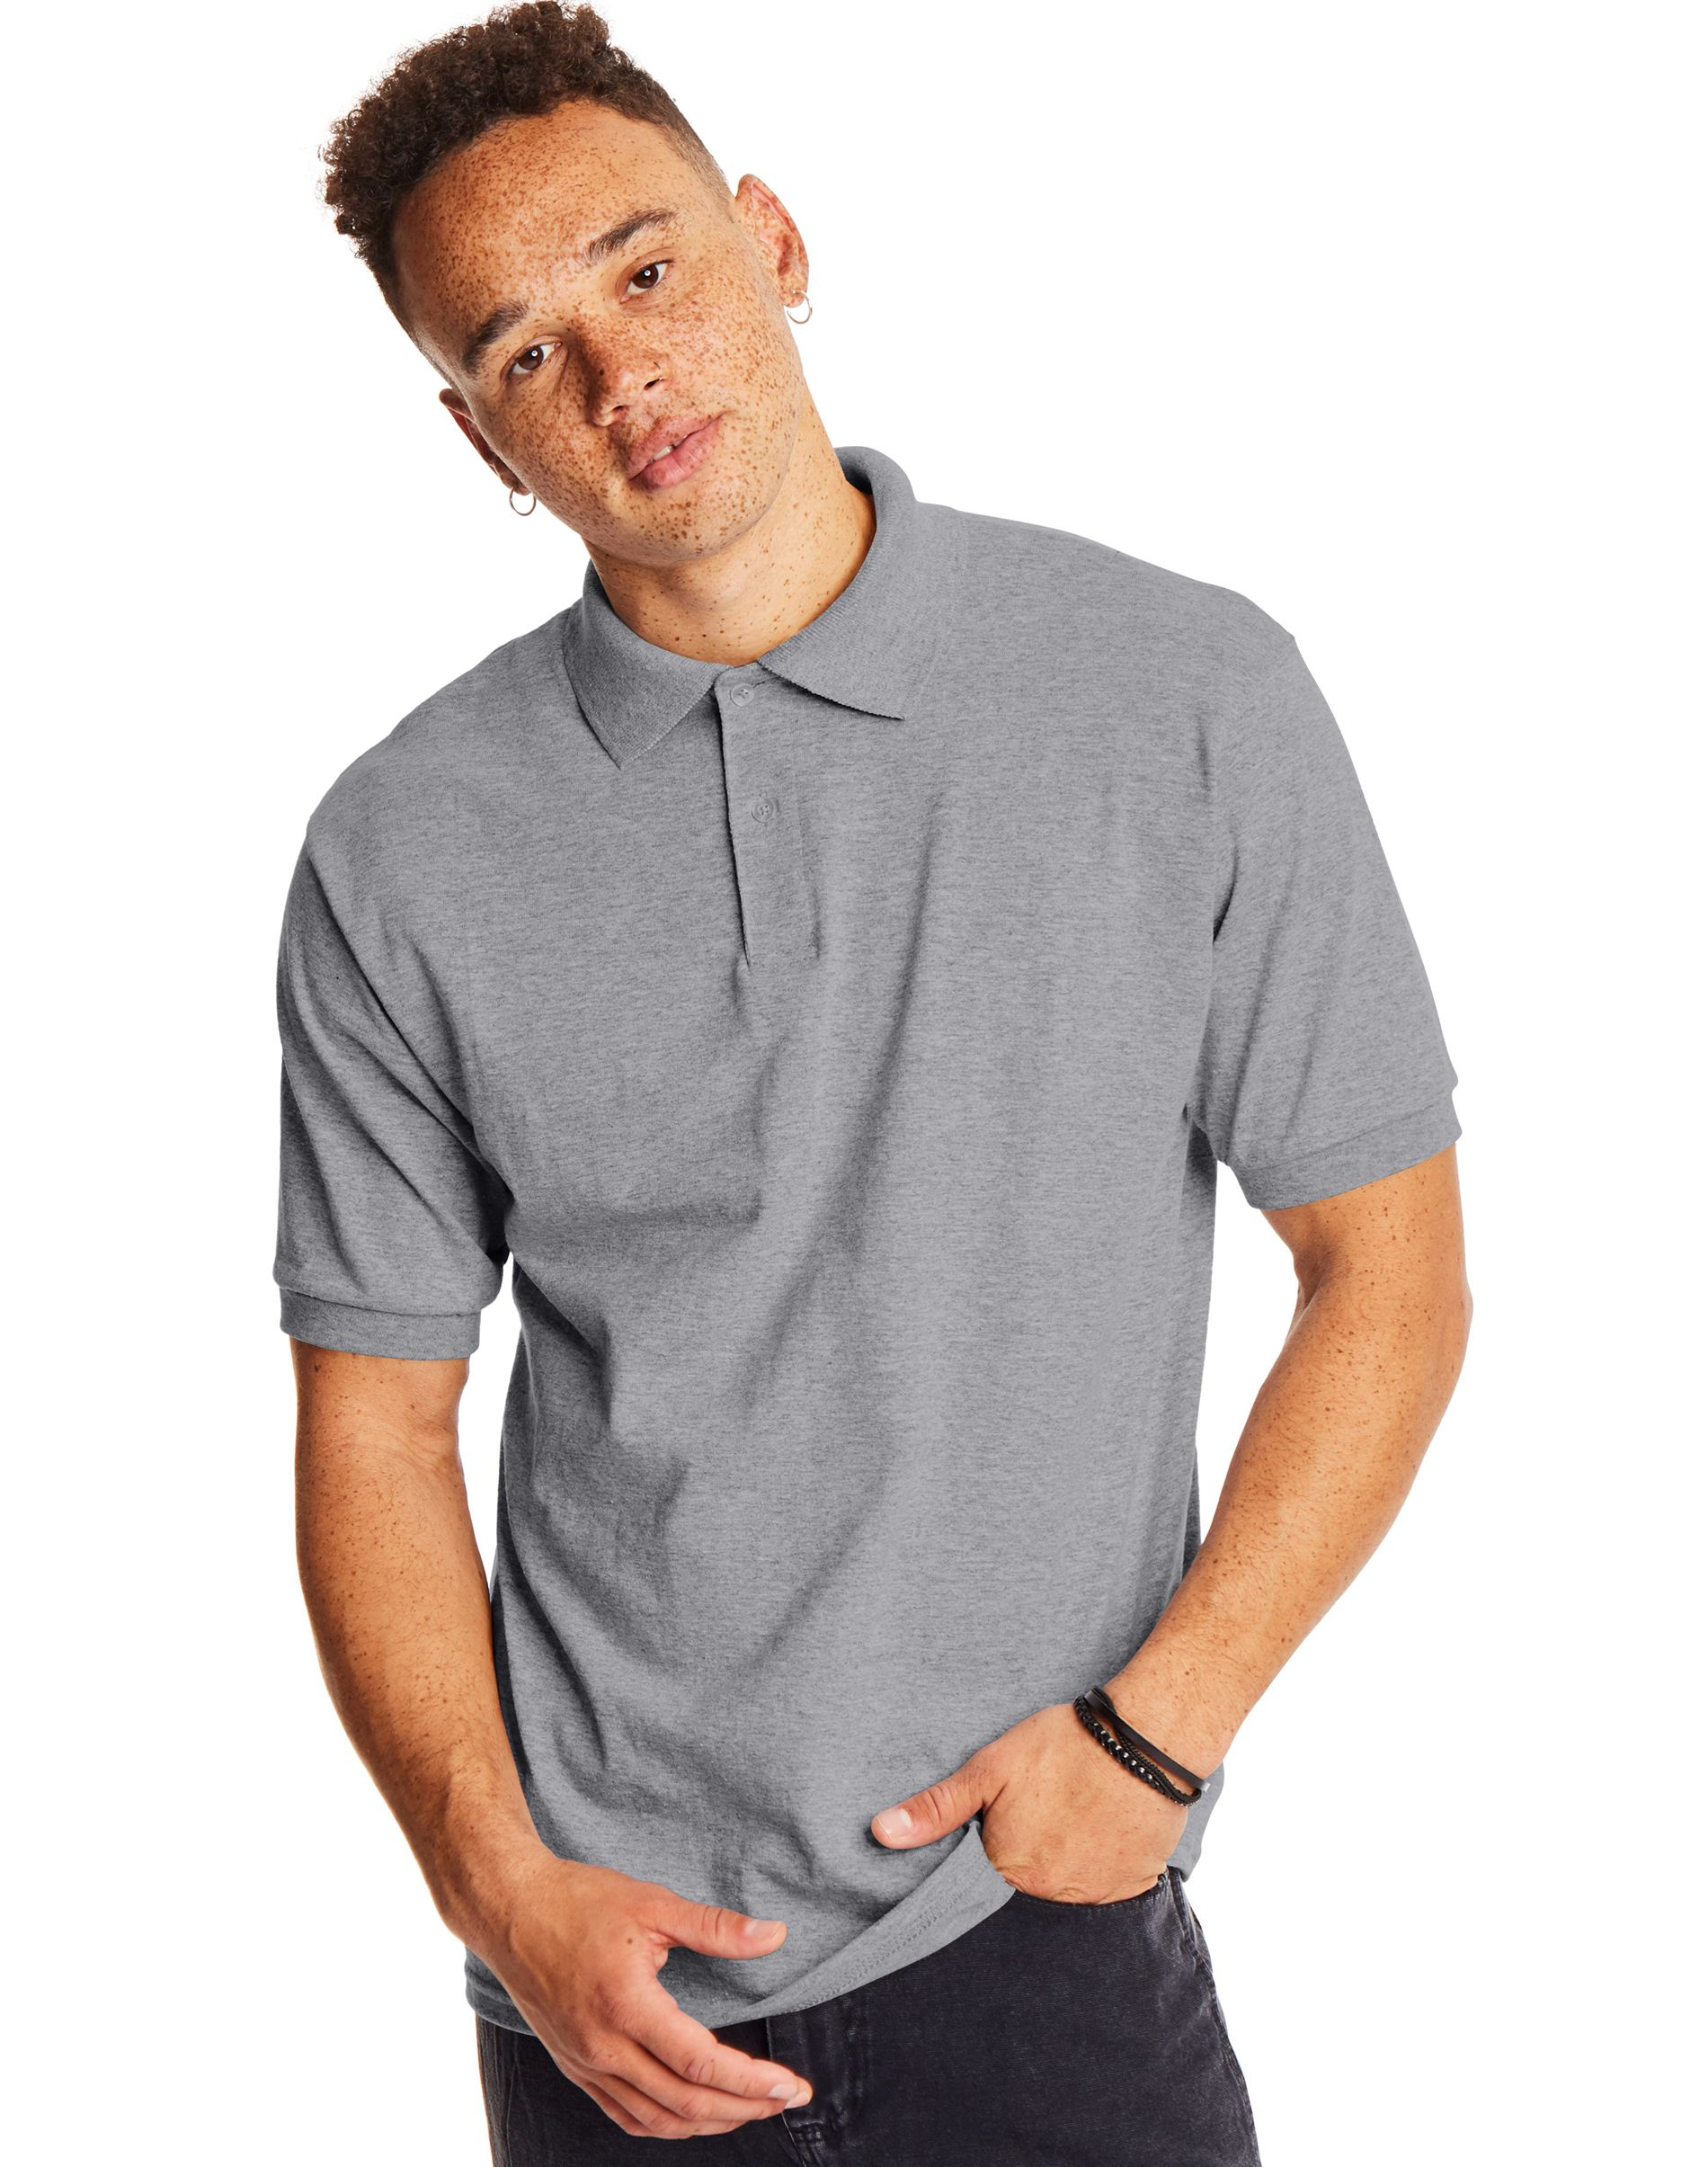 Hanes Men's Cotton-Blend EcoSmart® Jersey Polo men Hanes